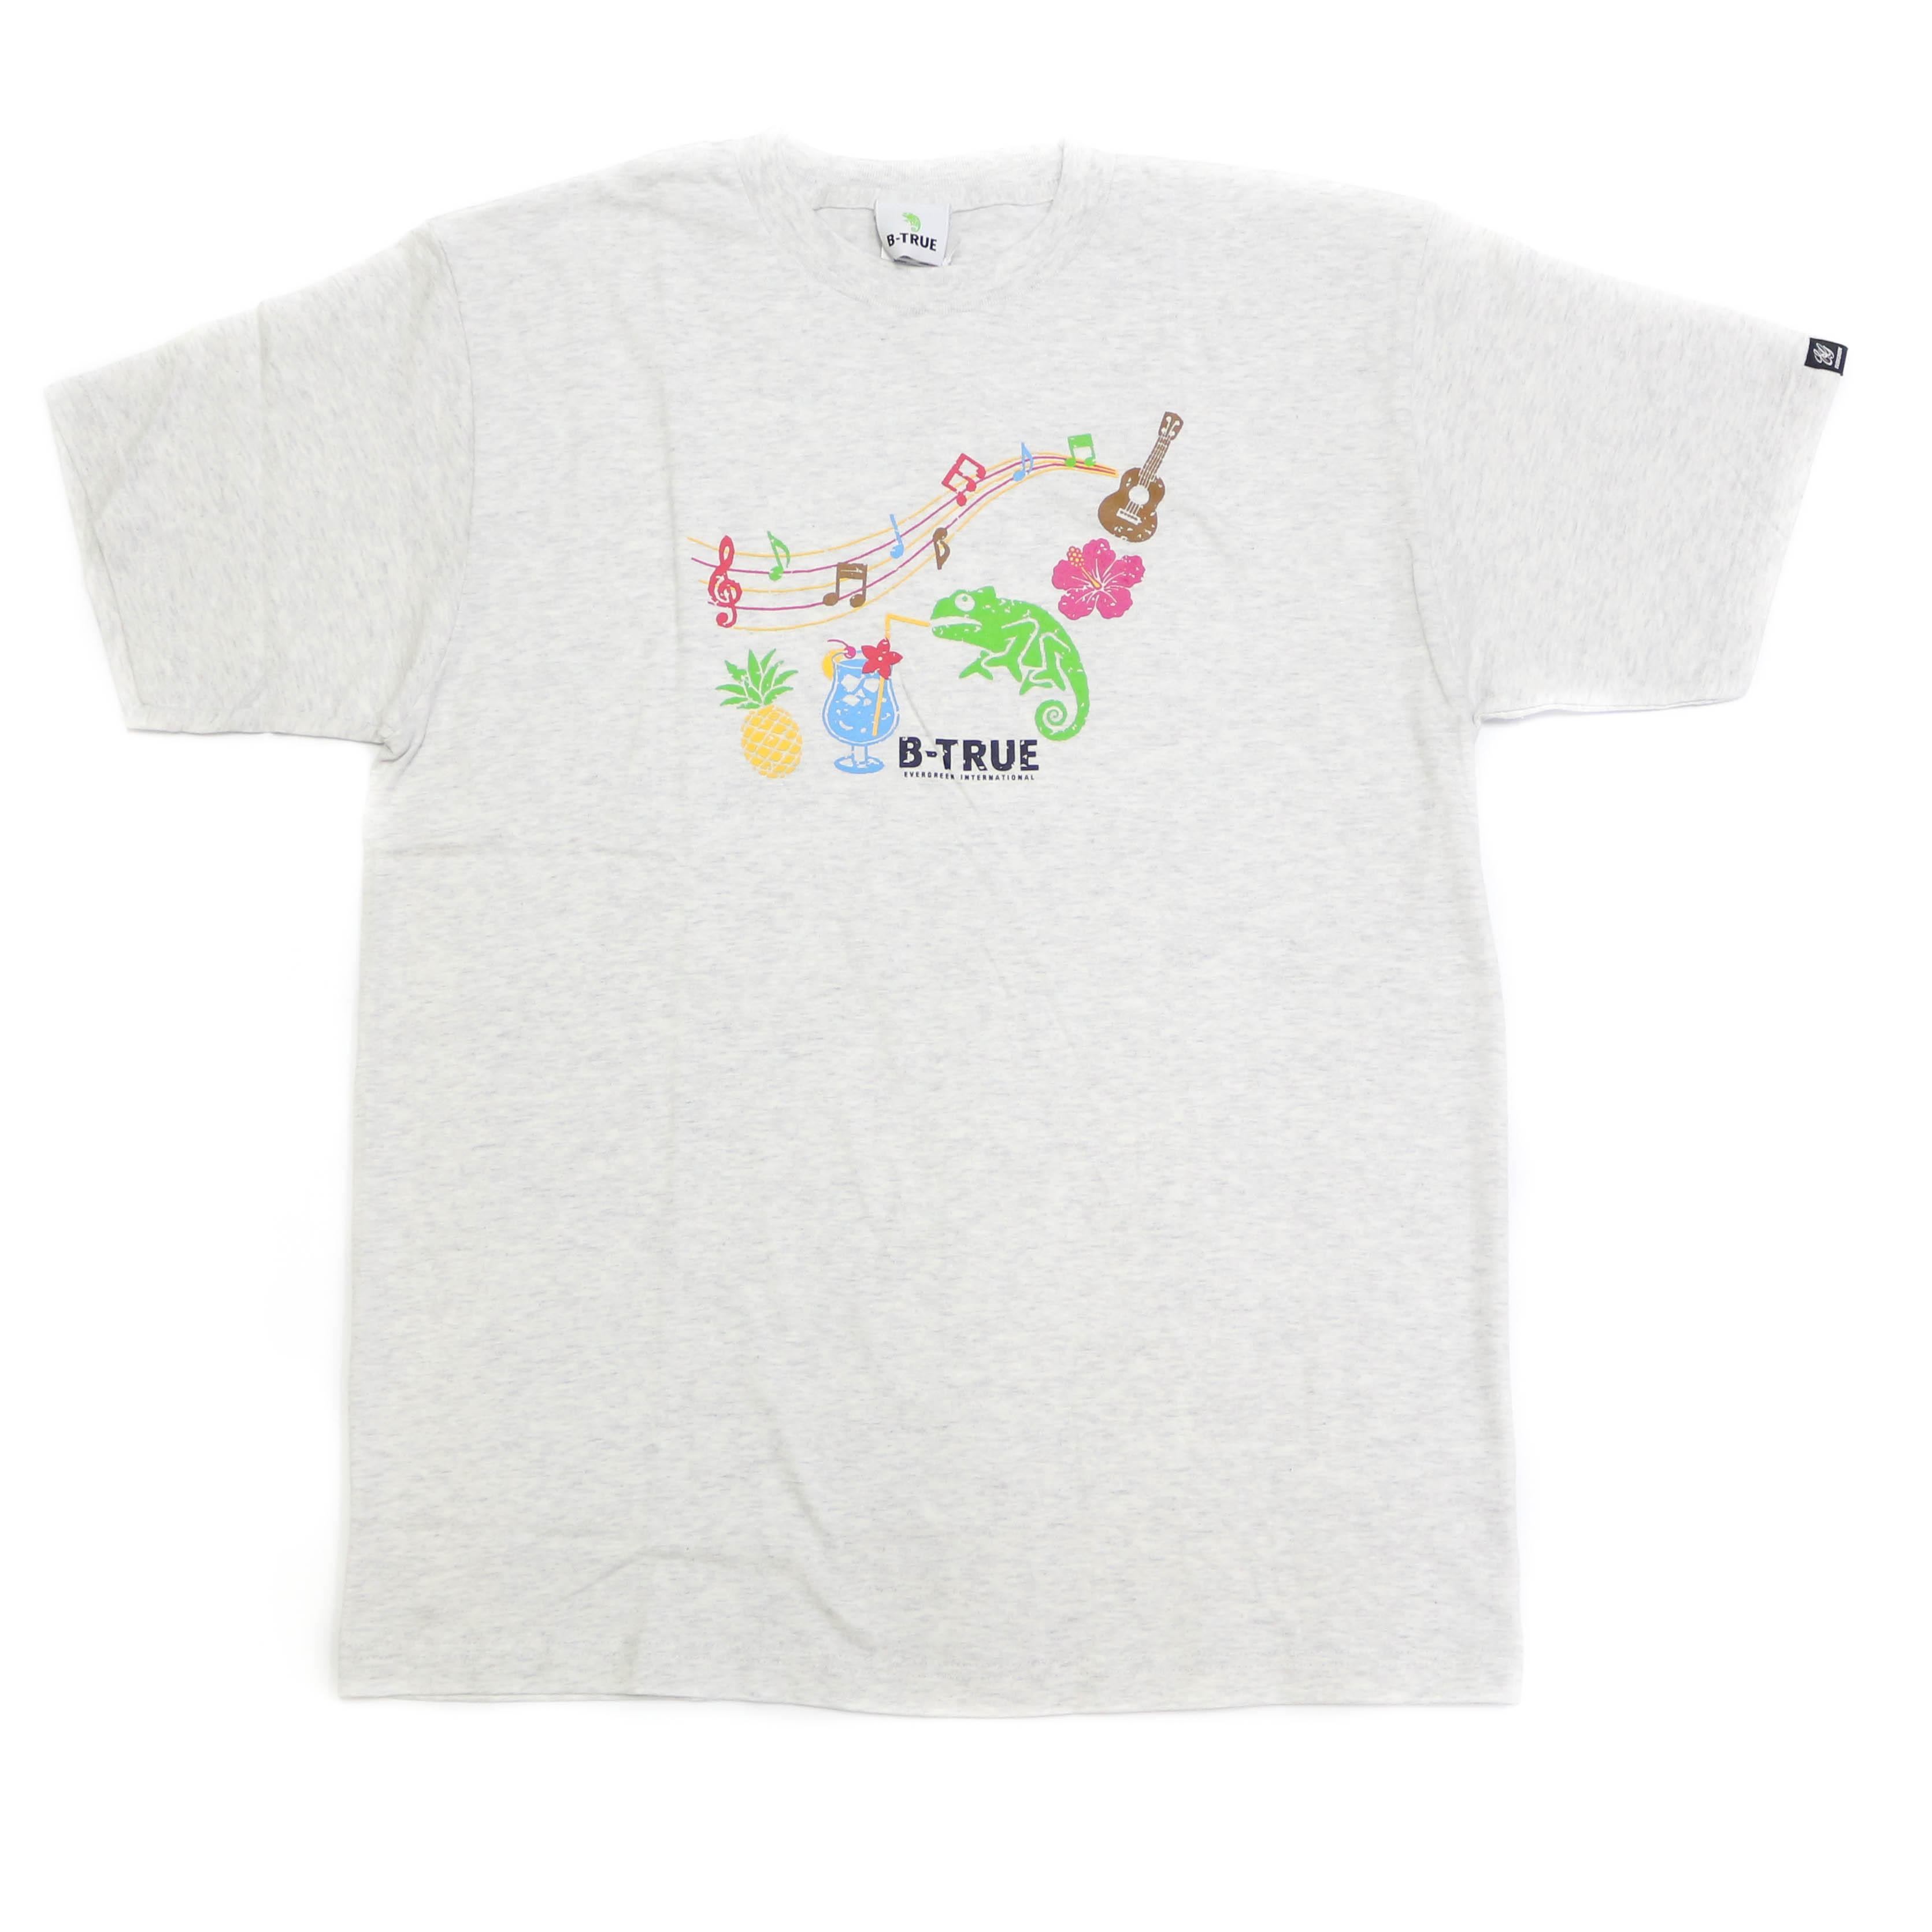 Evergreen T-Shirt Short Sleeve Type 1 Size M Ash (0694)